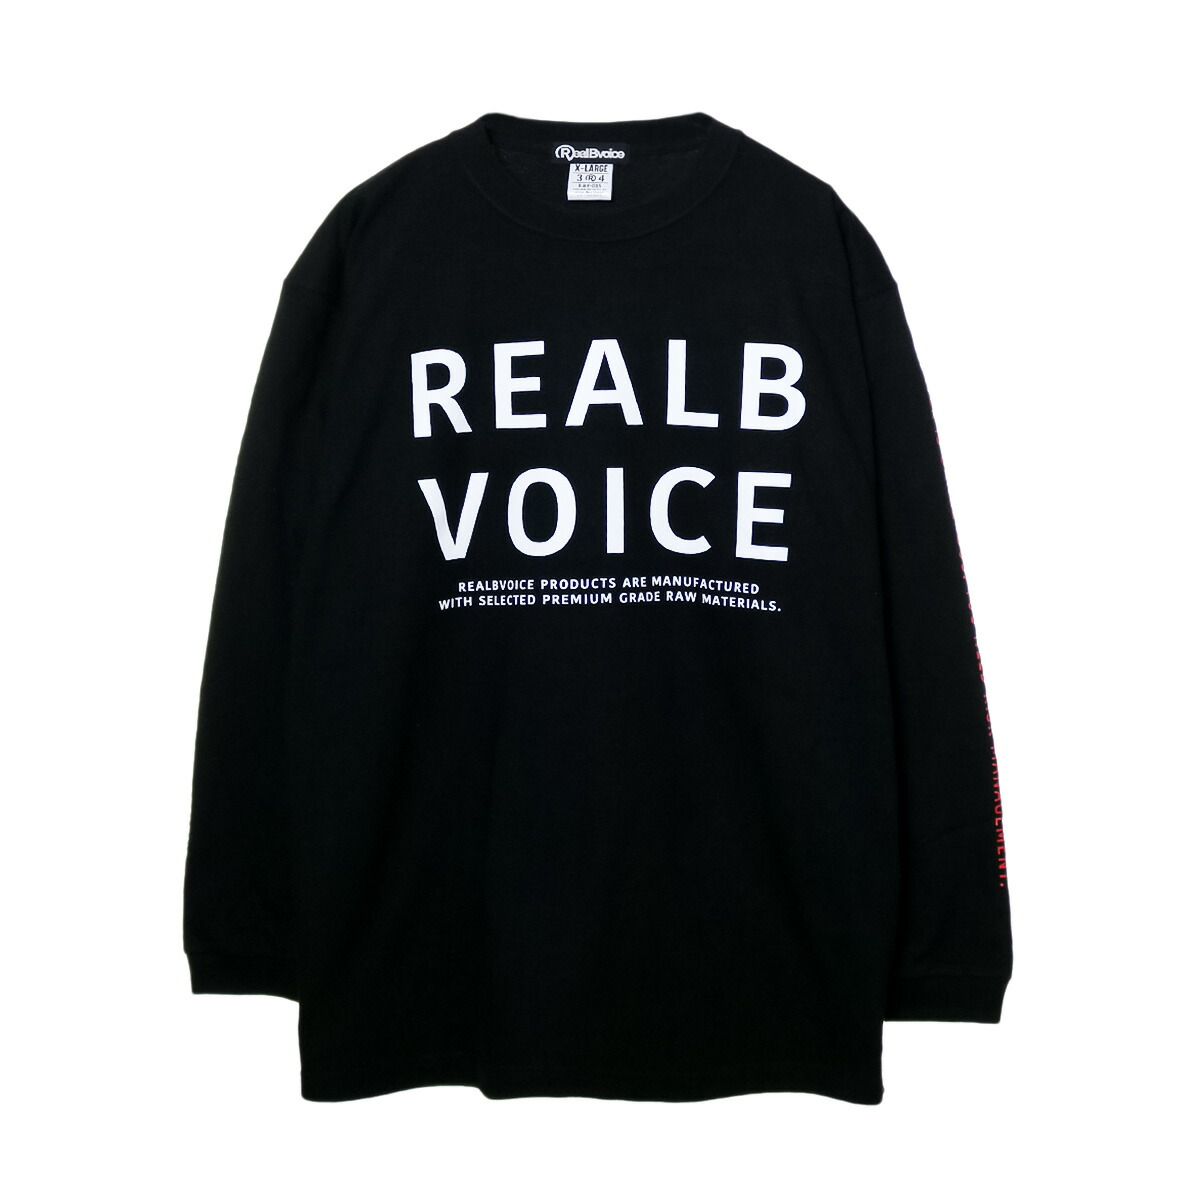 REALBVOICE PRODUCT LONG T-SHIRT